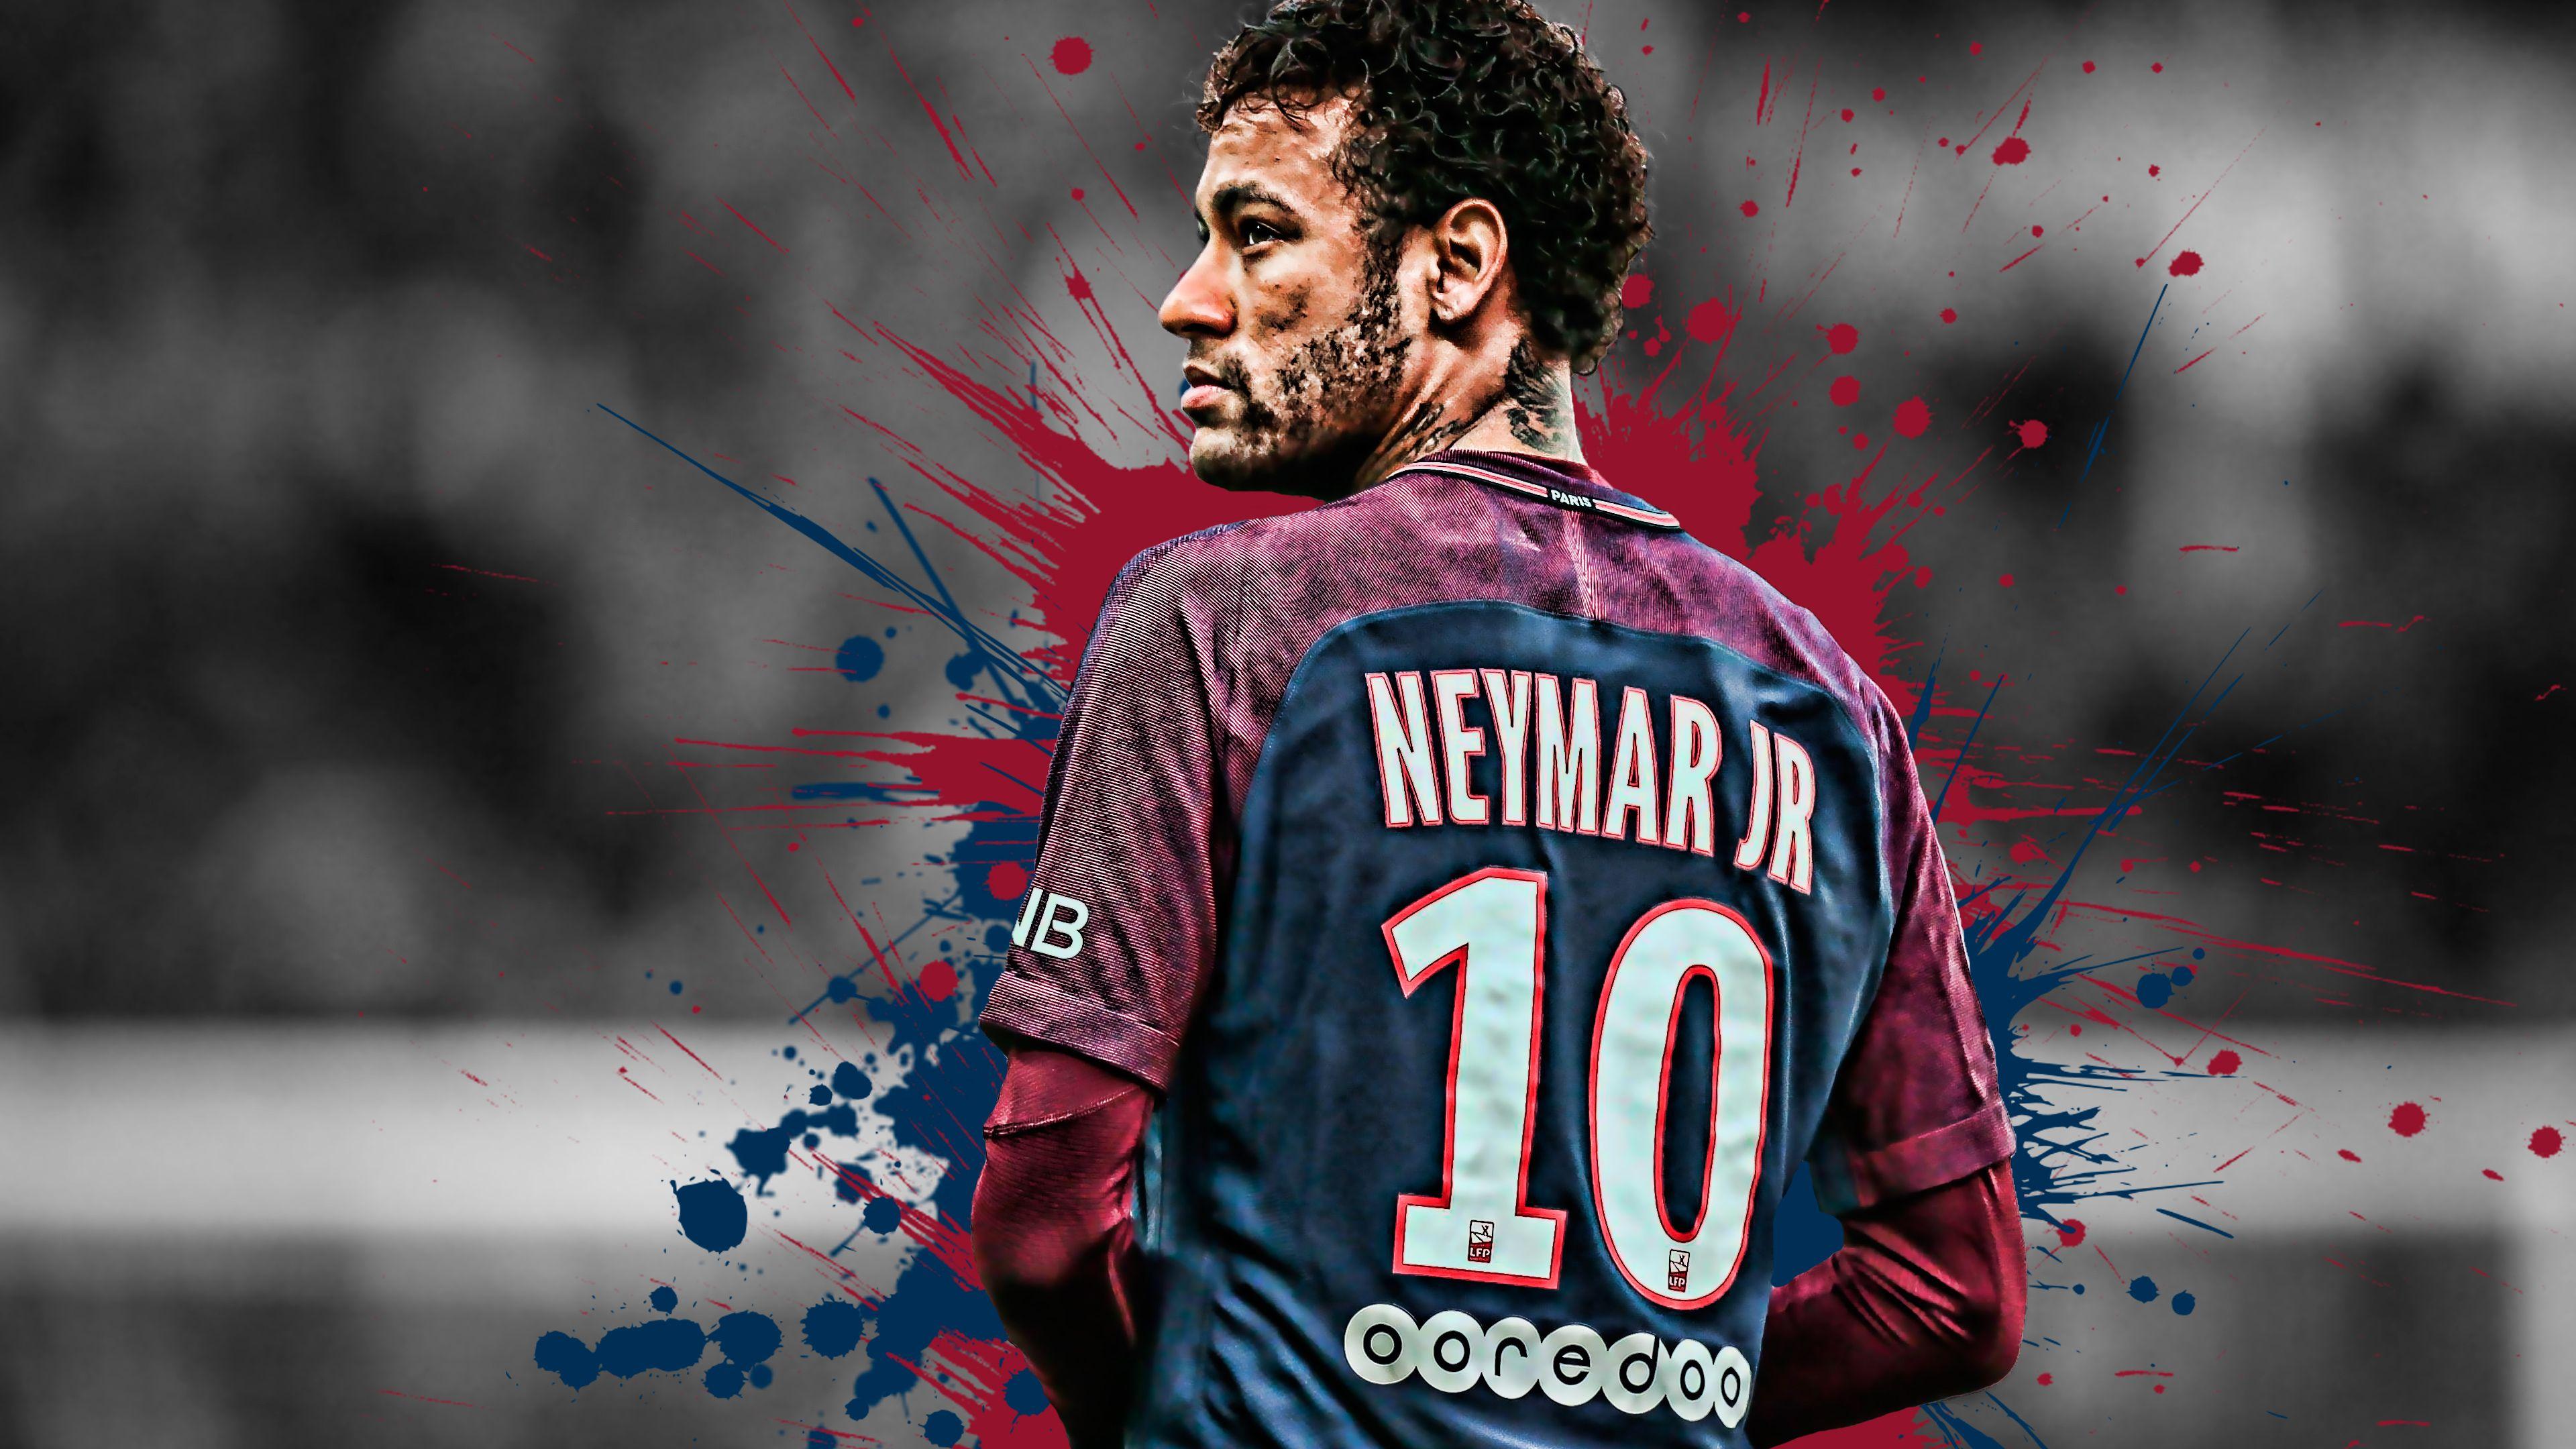 Neymar Brazilian Football Player 4k Neymar Football Players Neymar Jr